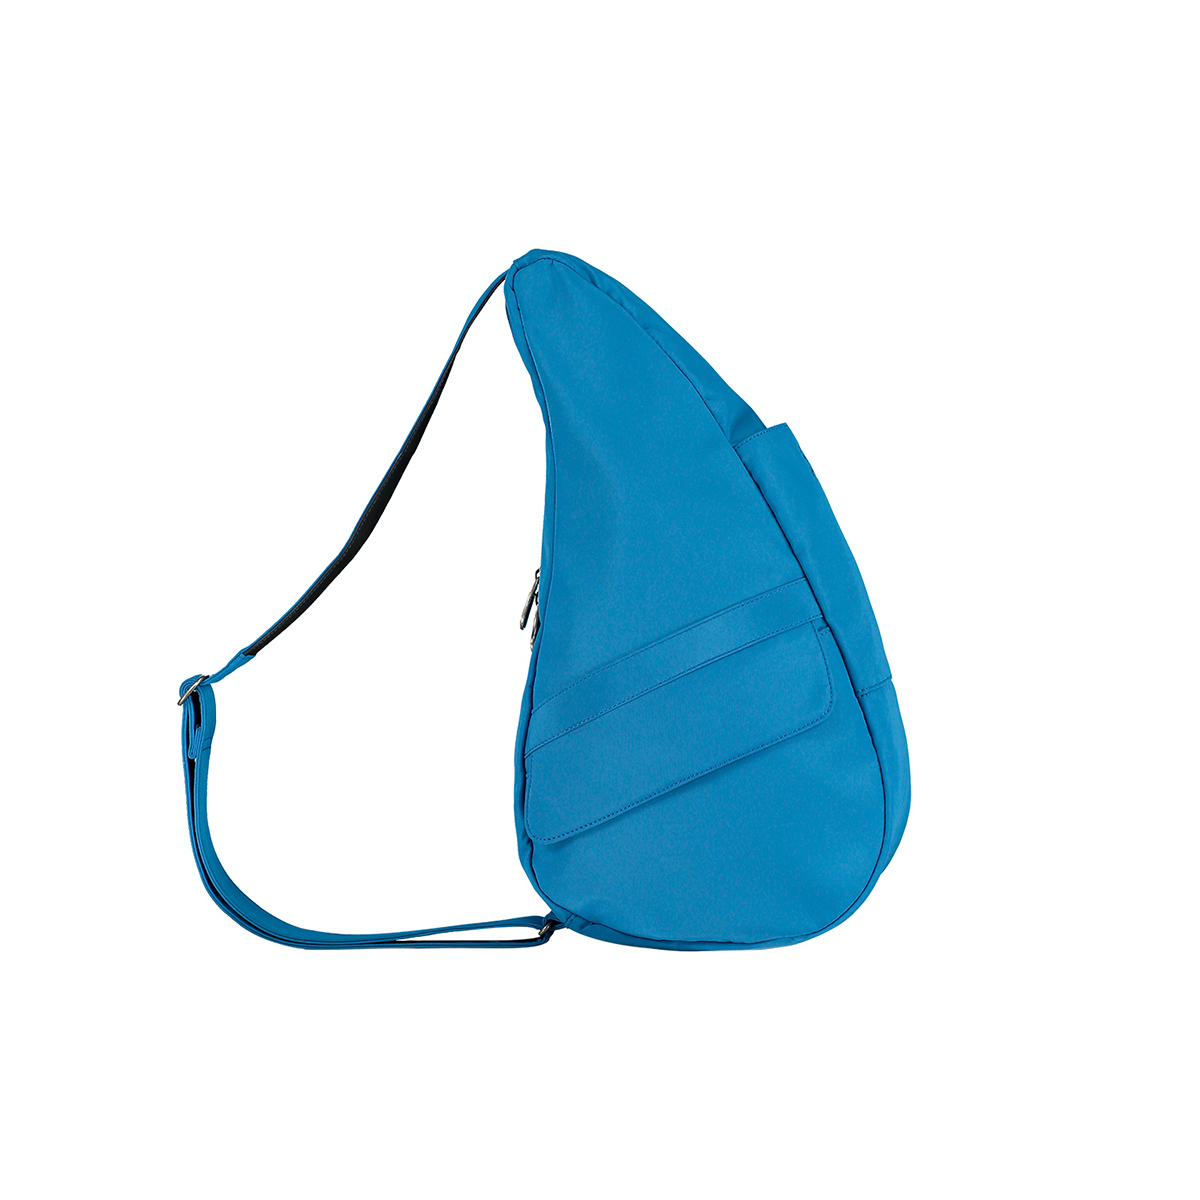 Healthy Back Bag/ヘルシーバックバッグ/ショルダーバッグ/ボディバッグ/旅行バッグ/軽量/レディース/メンズ 公式ストア ヘルシーバックバッグ マイクロファイバー Sサイズ ディープスカイ